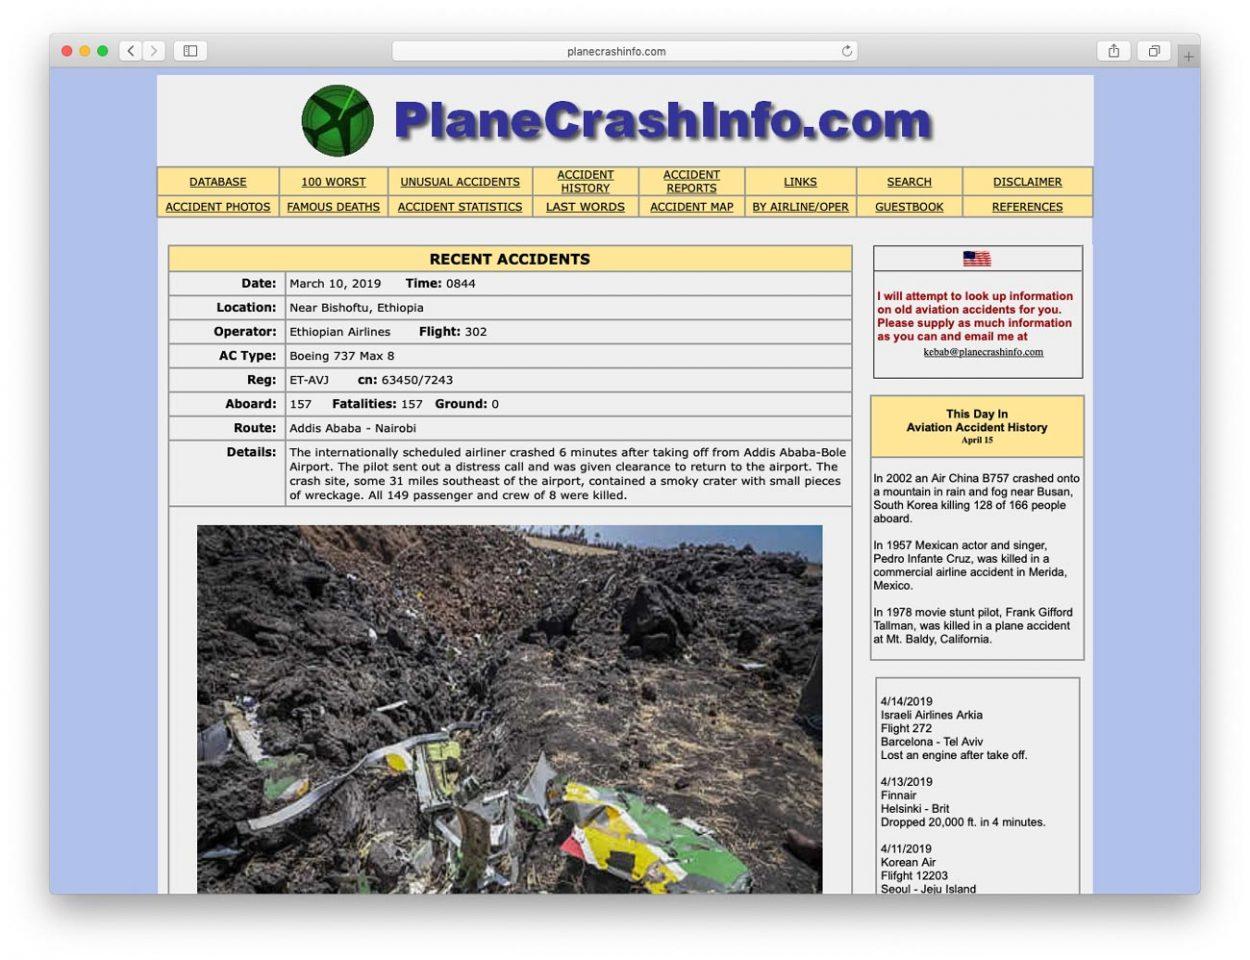 Cкриншот сайта: planecrashinfo.com